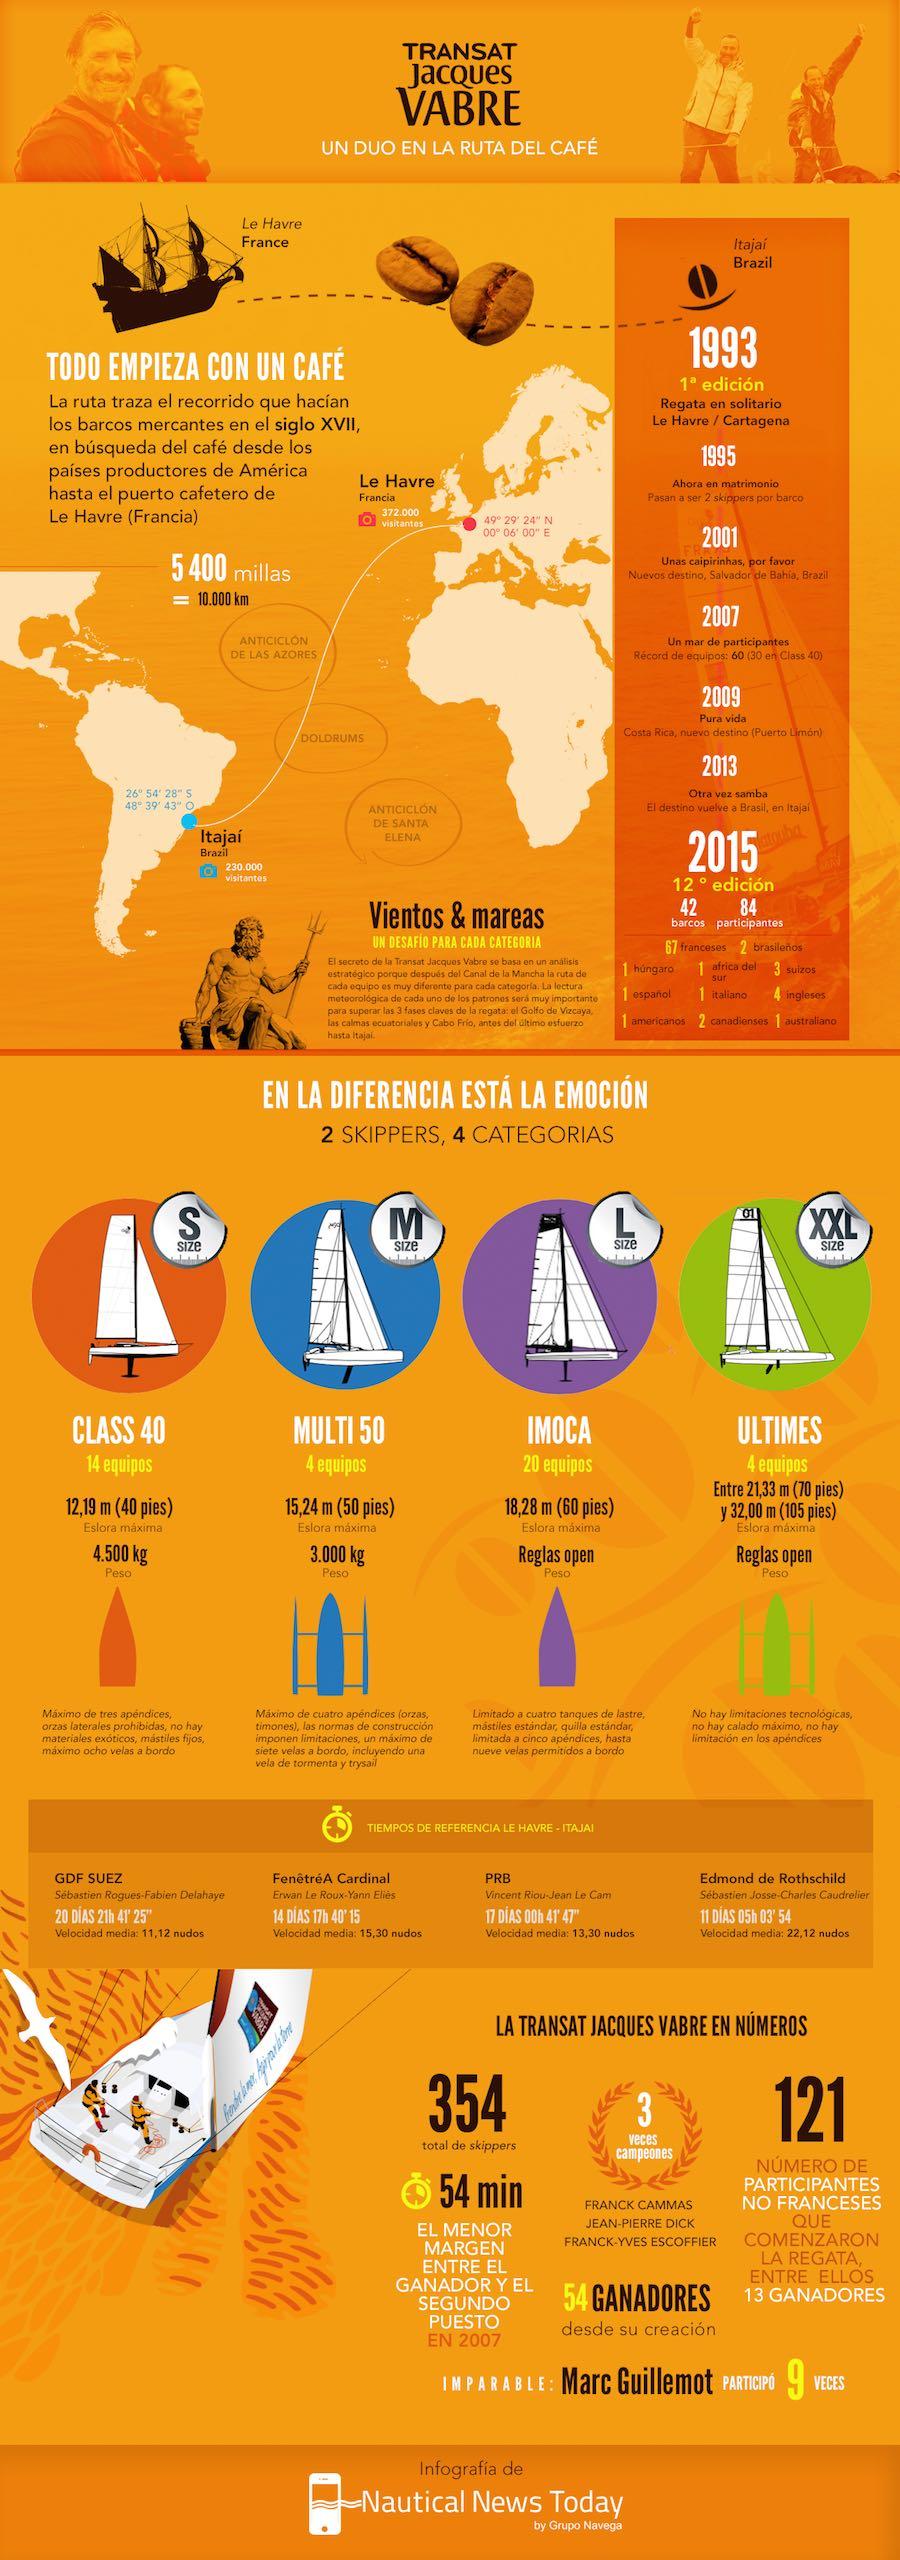 Transat Jacques Vabre - Infografia